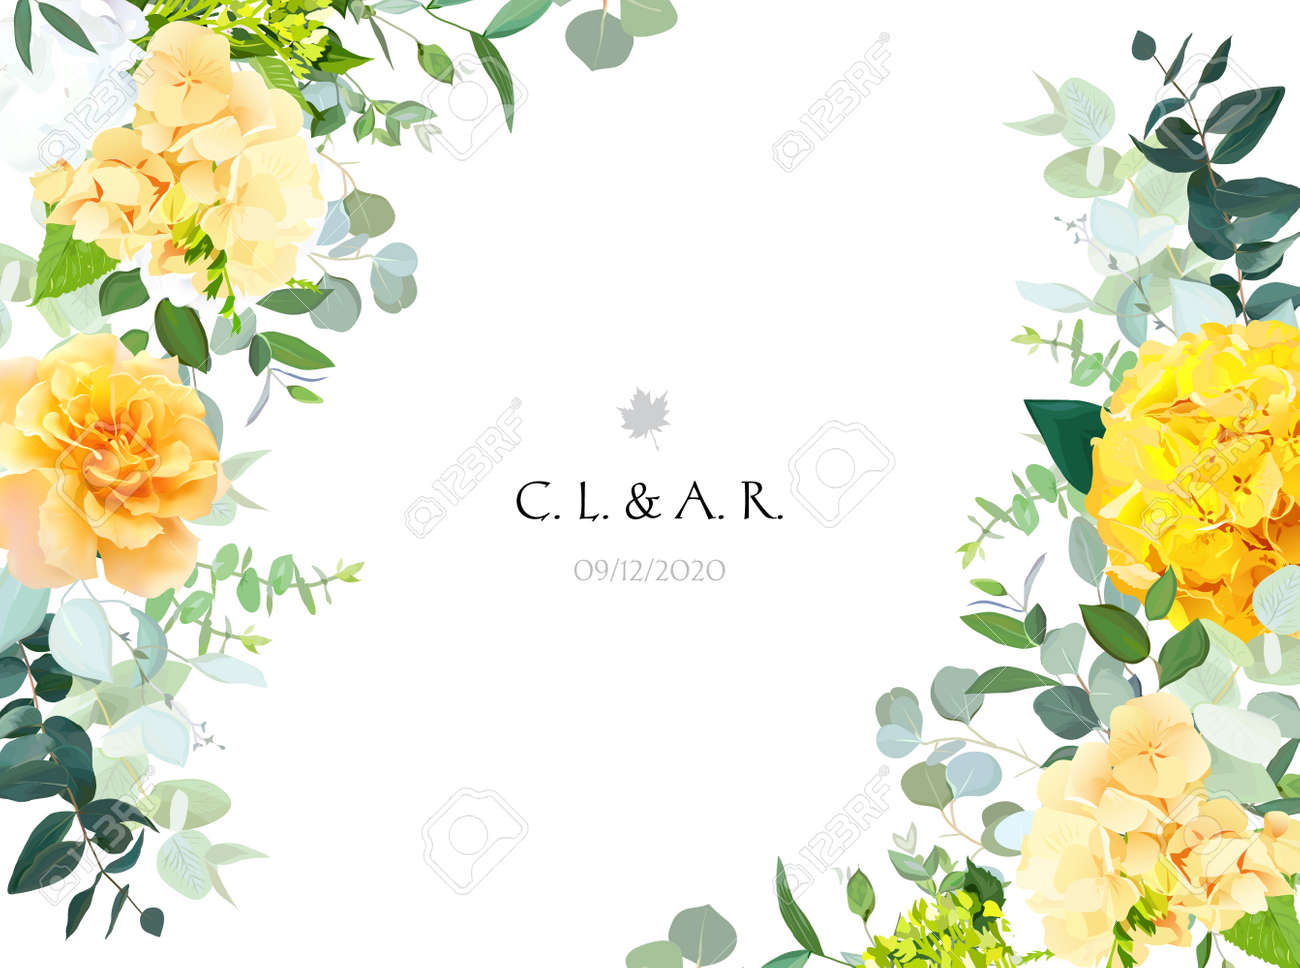 Yellow hydrangea, mustard rose, peony, white iris, orchid, spring garden flowers - 159337754